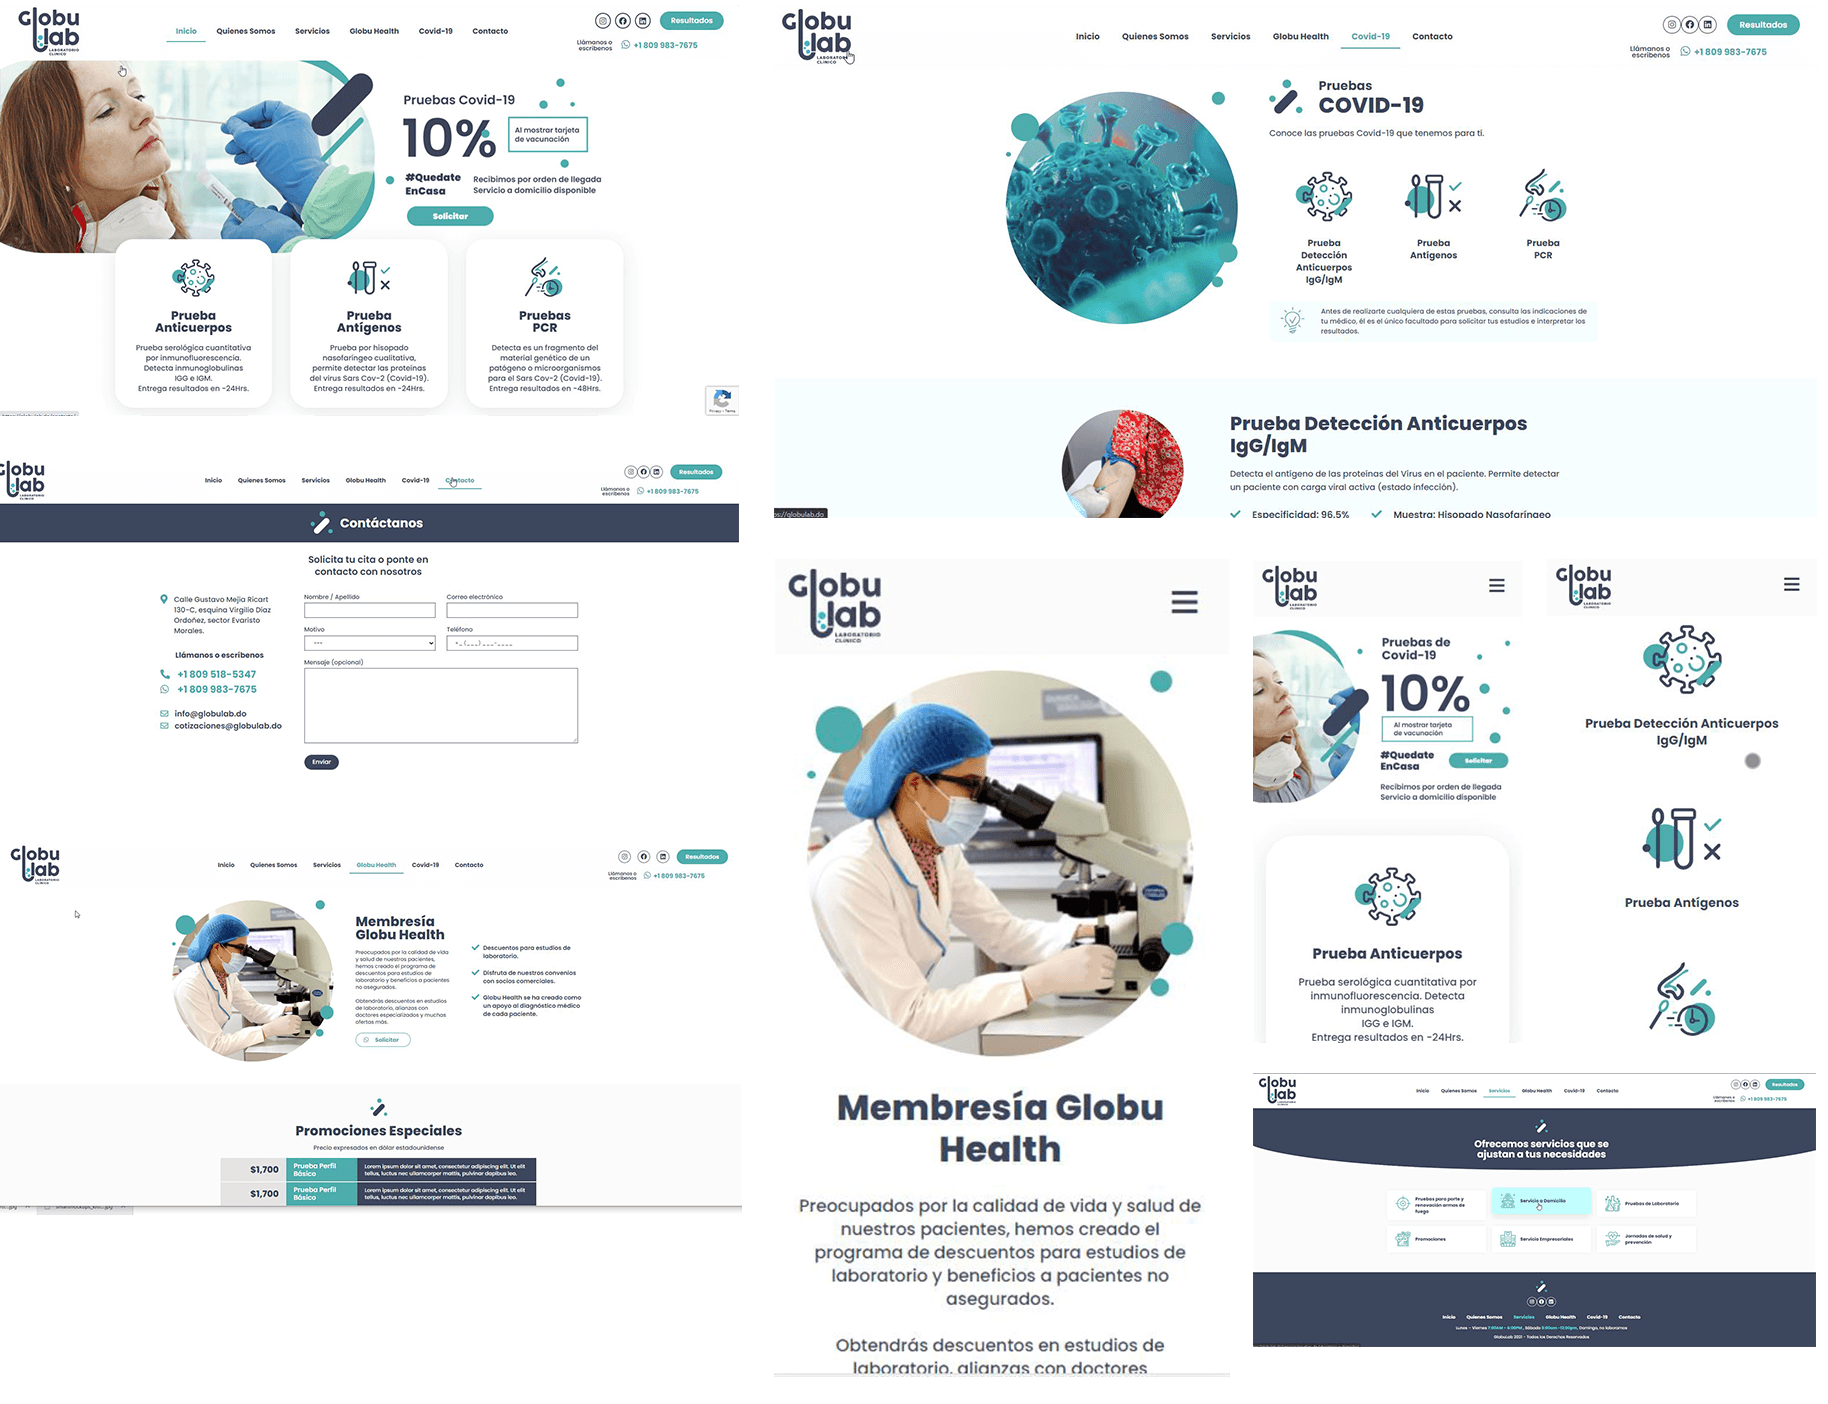 globulab-design-mockup-adobe-xd-wordpress-laboratory-website-raylin-aquino